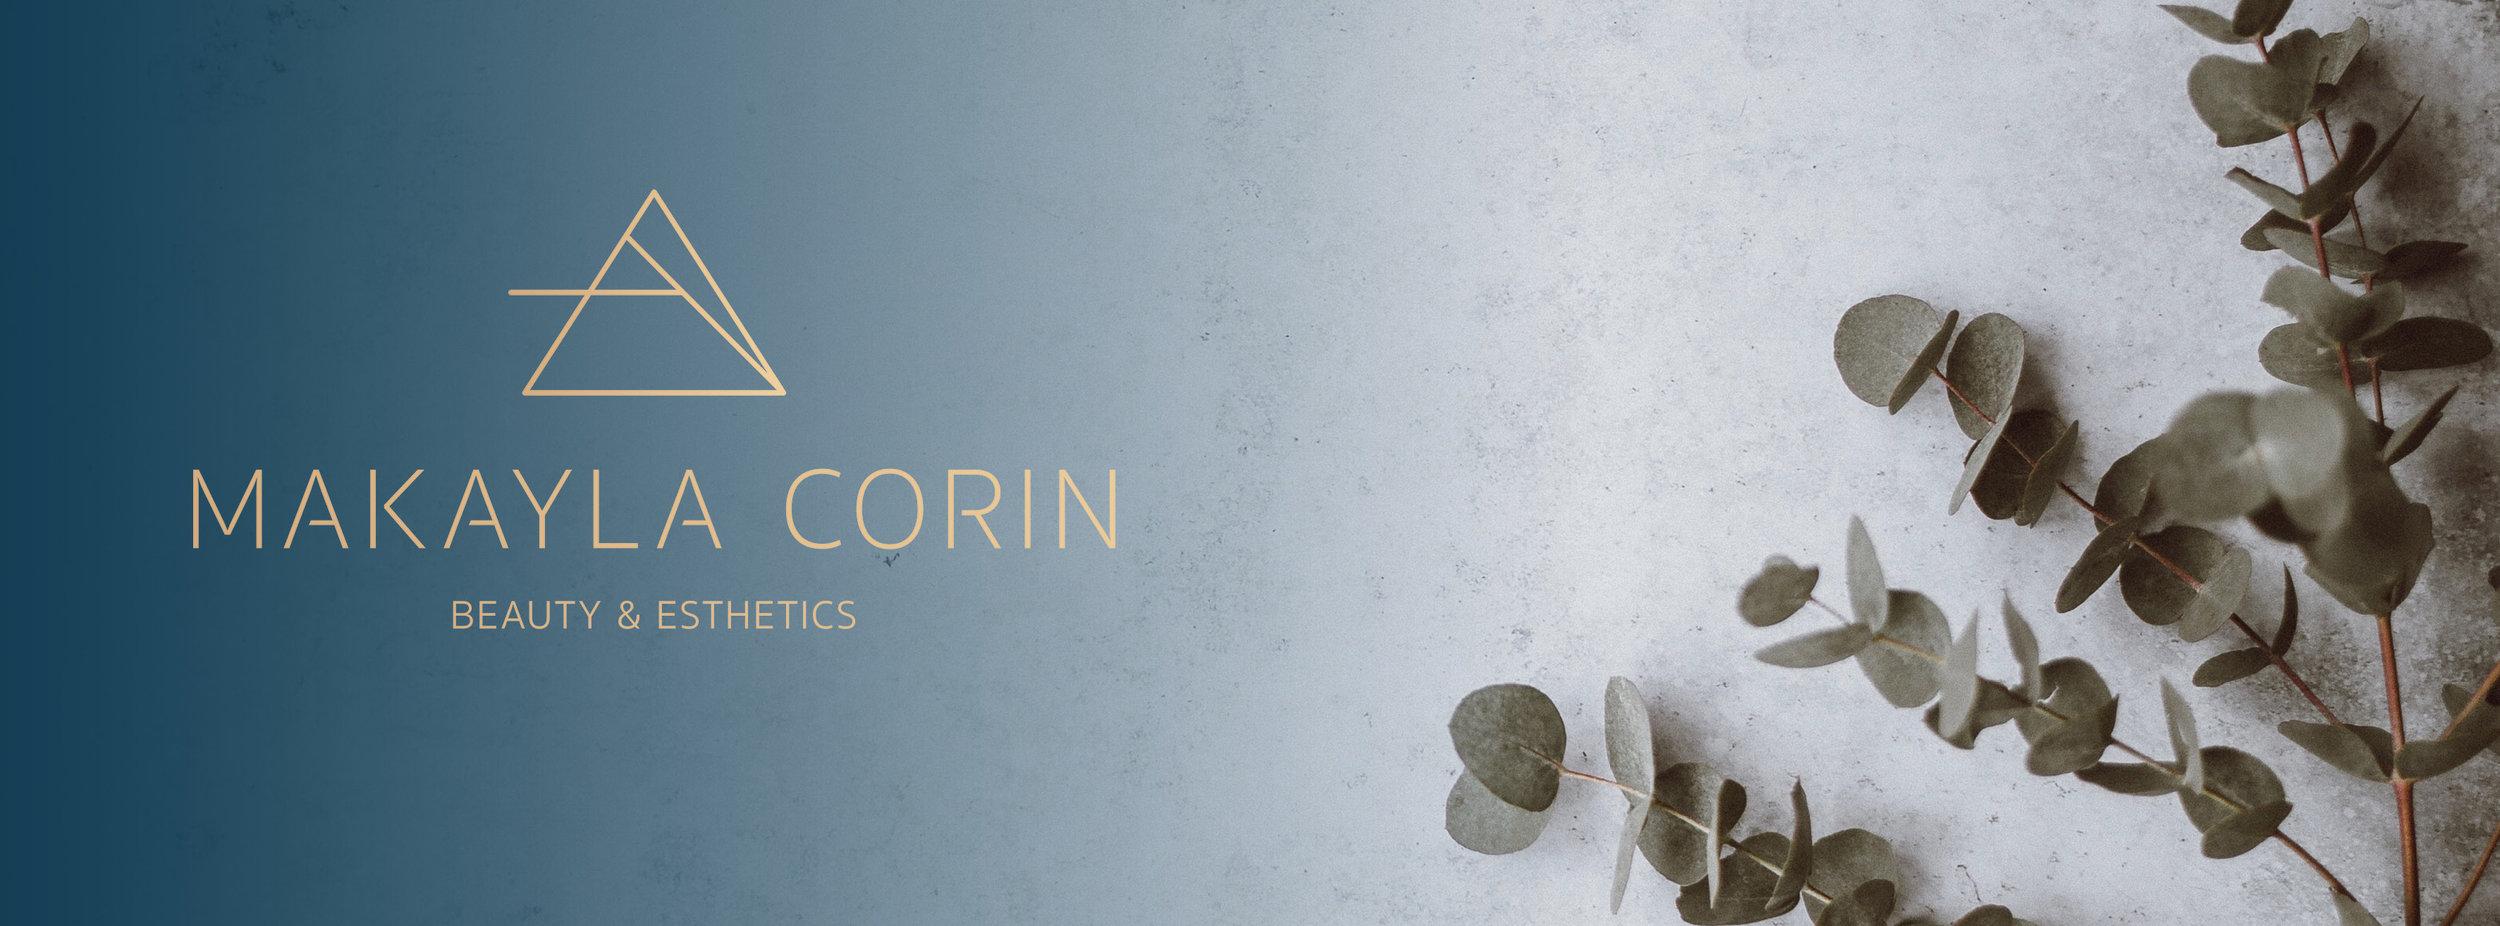 Makayla Corin Brand Branding Logo Design Graphic Design